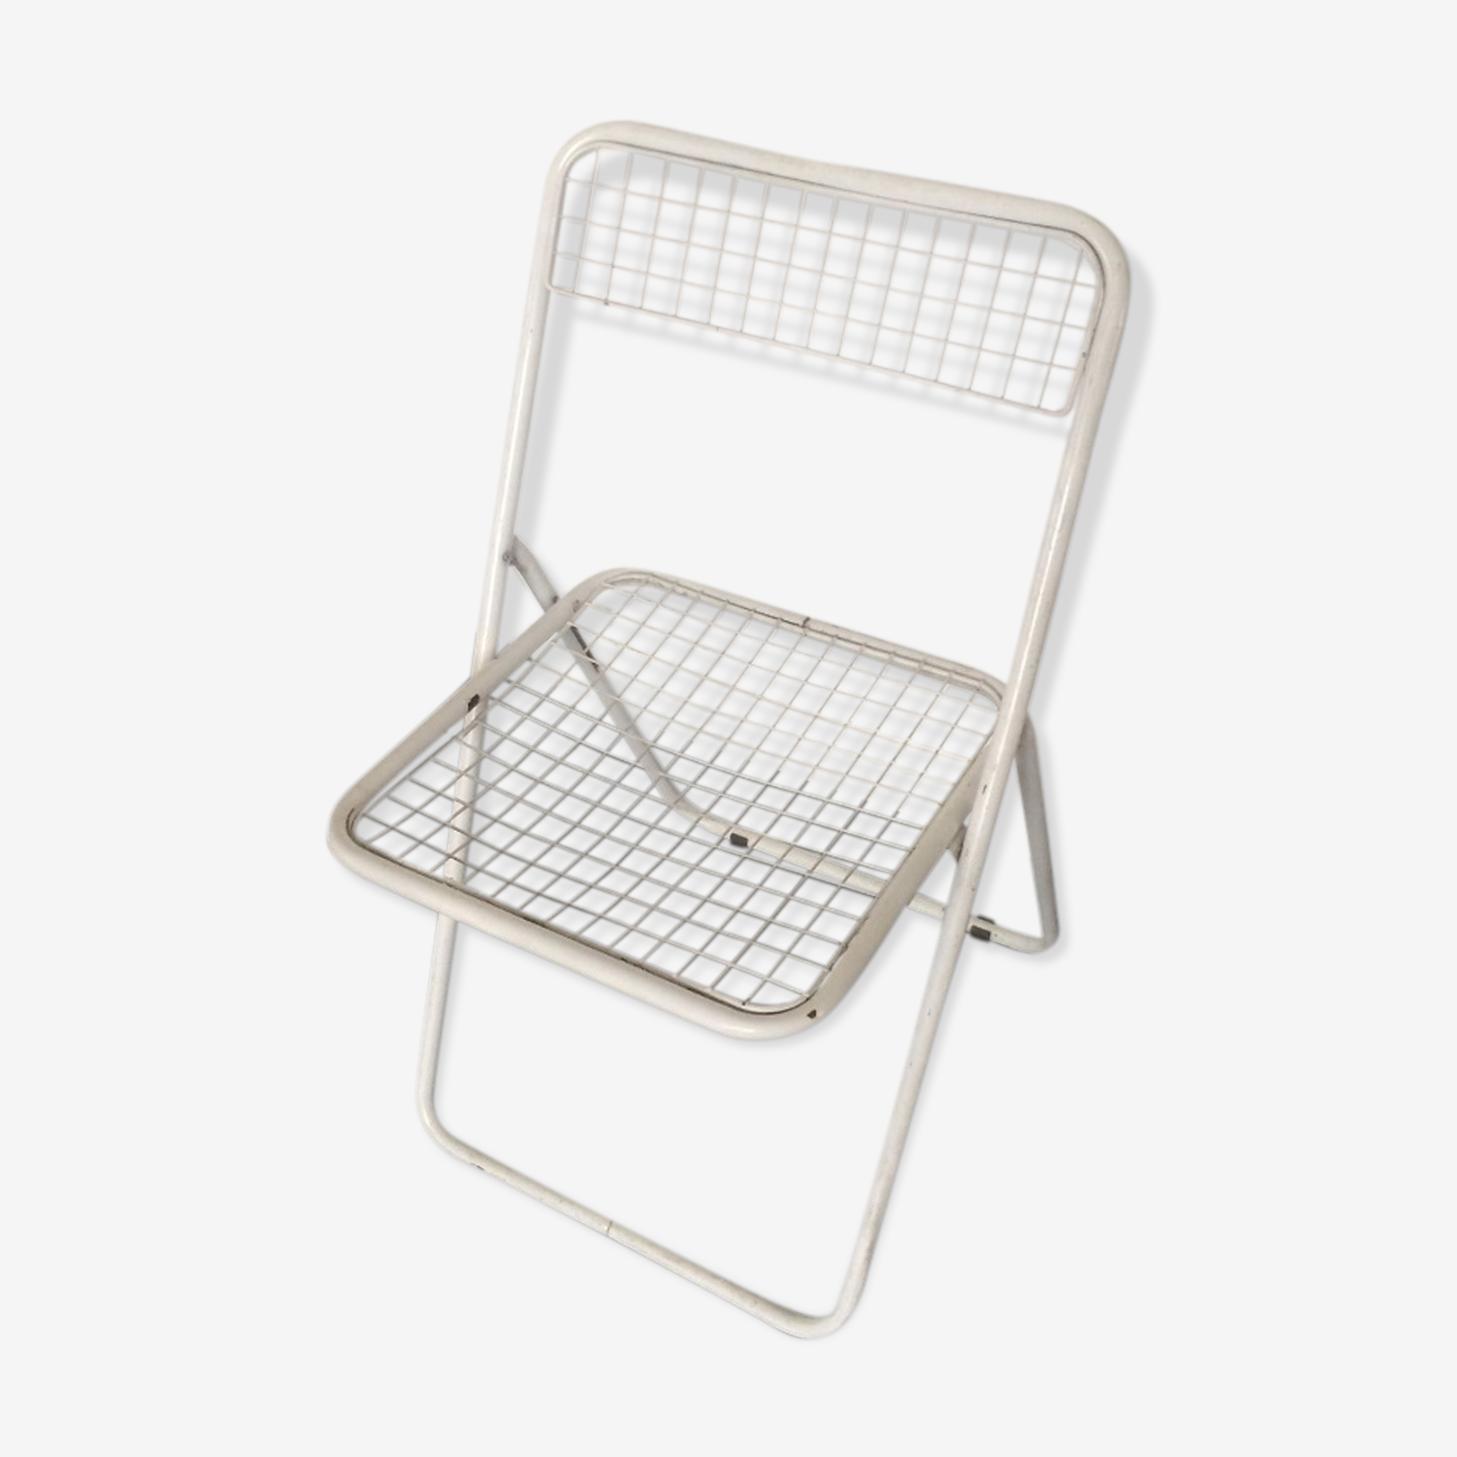 Chairs 'net ted' by Niels Gammelgaard, 1978